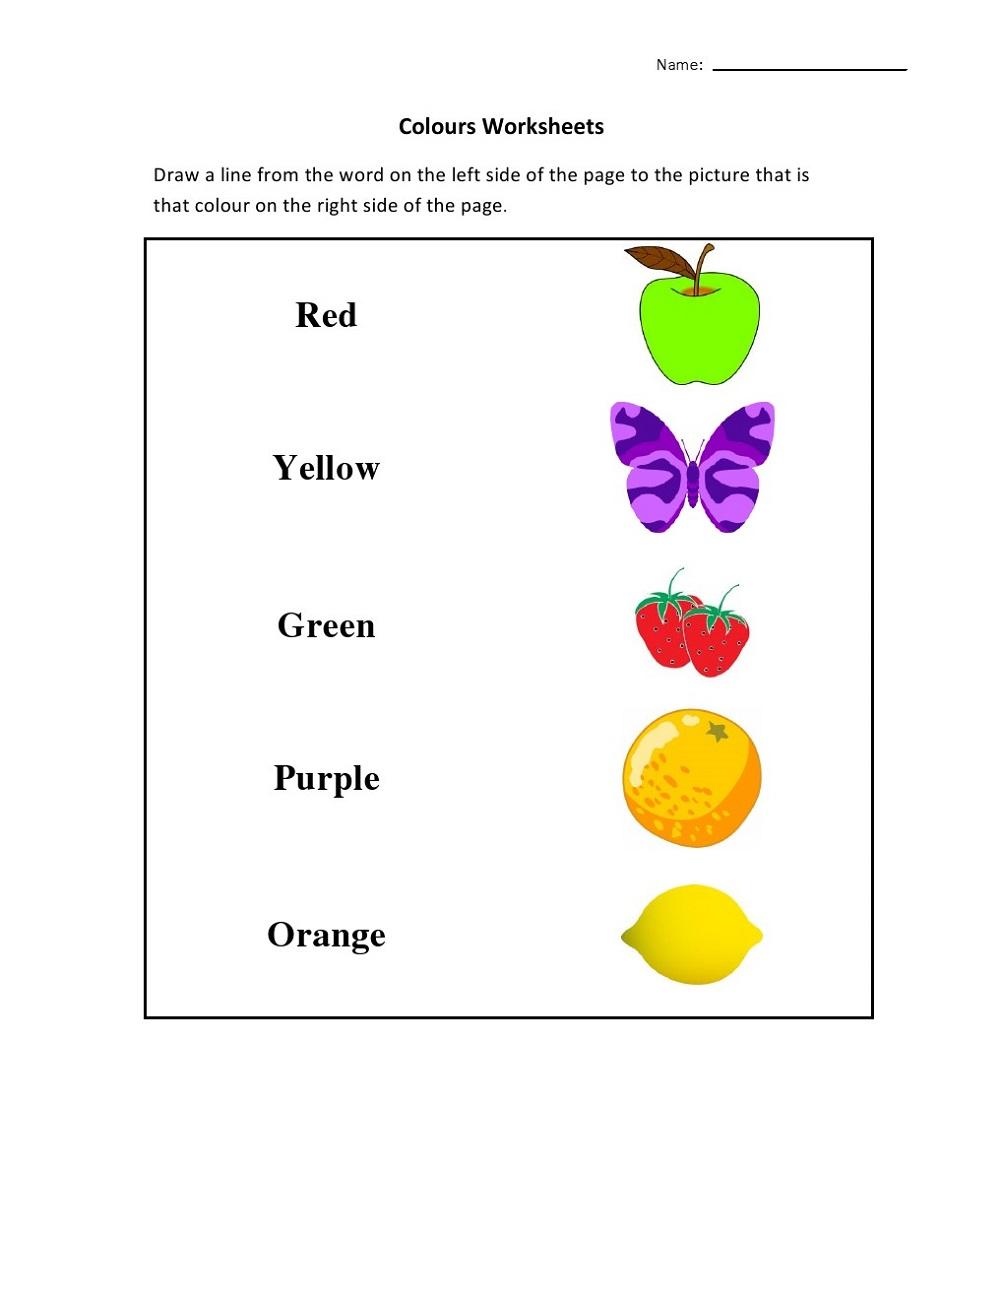 Free Printable Worksheets for Lkg Colours